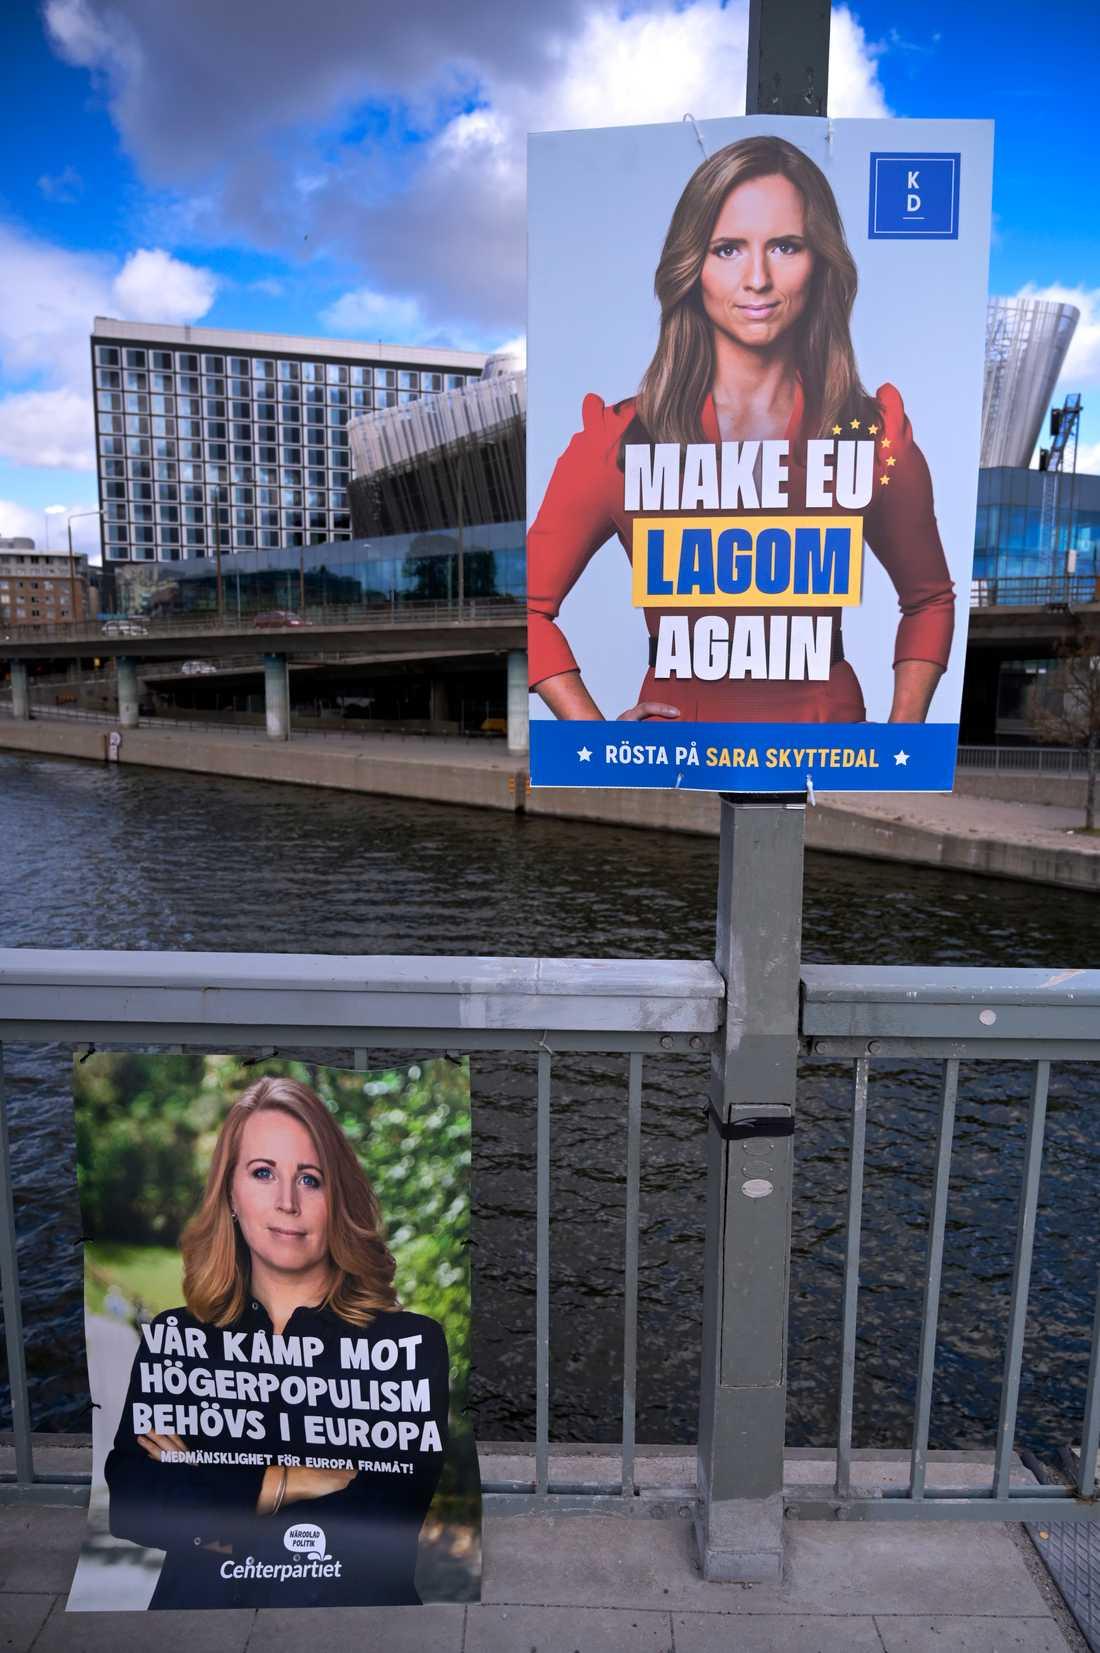 Valaffischer inför Europaparlamentsvalet 2019.